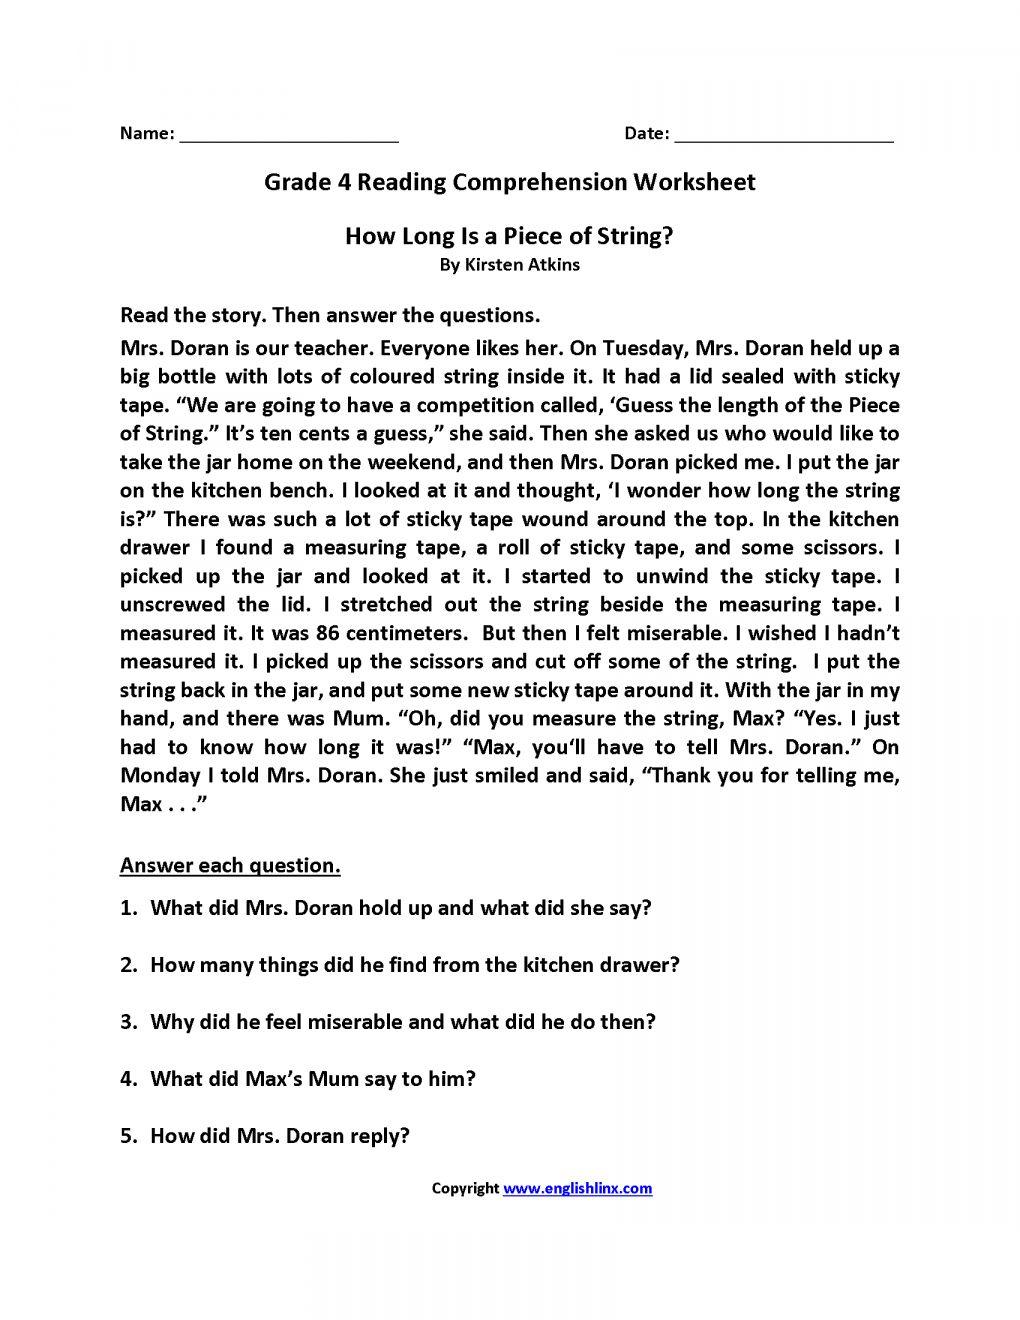 9 4th Grade English Comprehension Worksheets Reading Comprehension Worksheets Reading Comprehension Comprehension Worksheets [ 1320 x 1020 Pixel ]